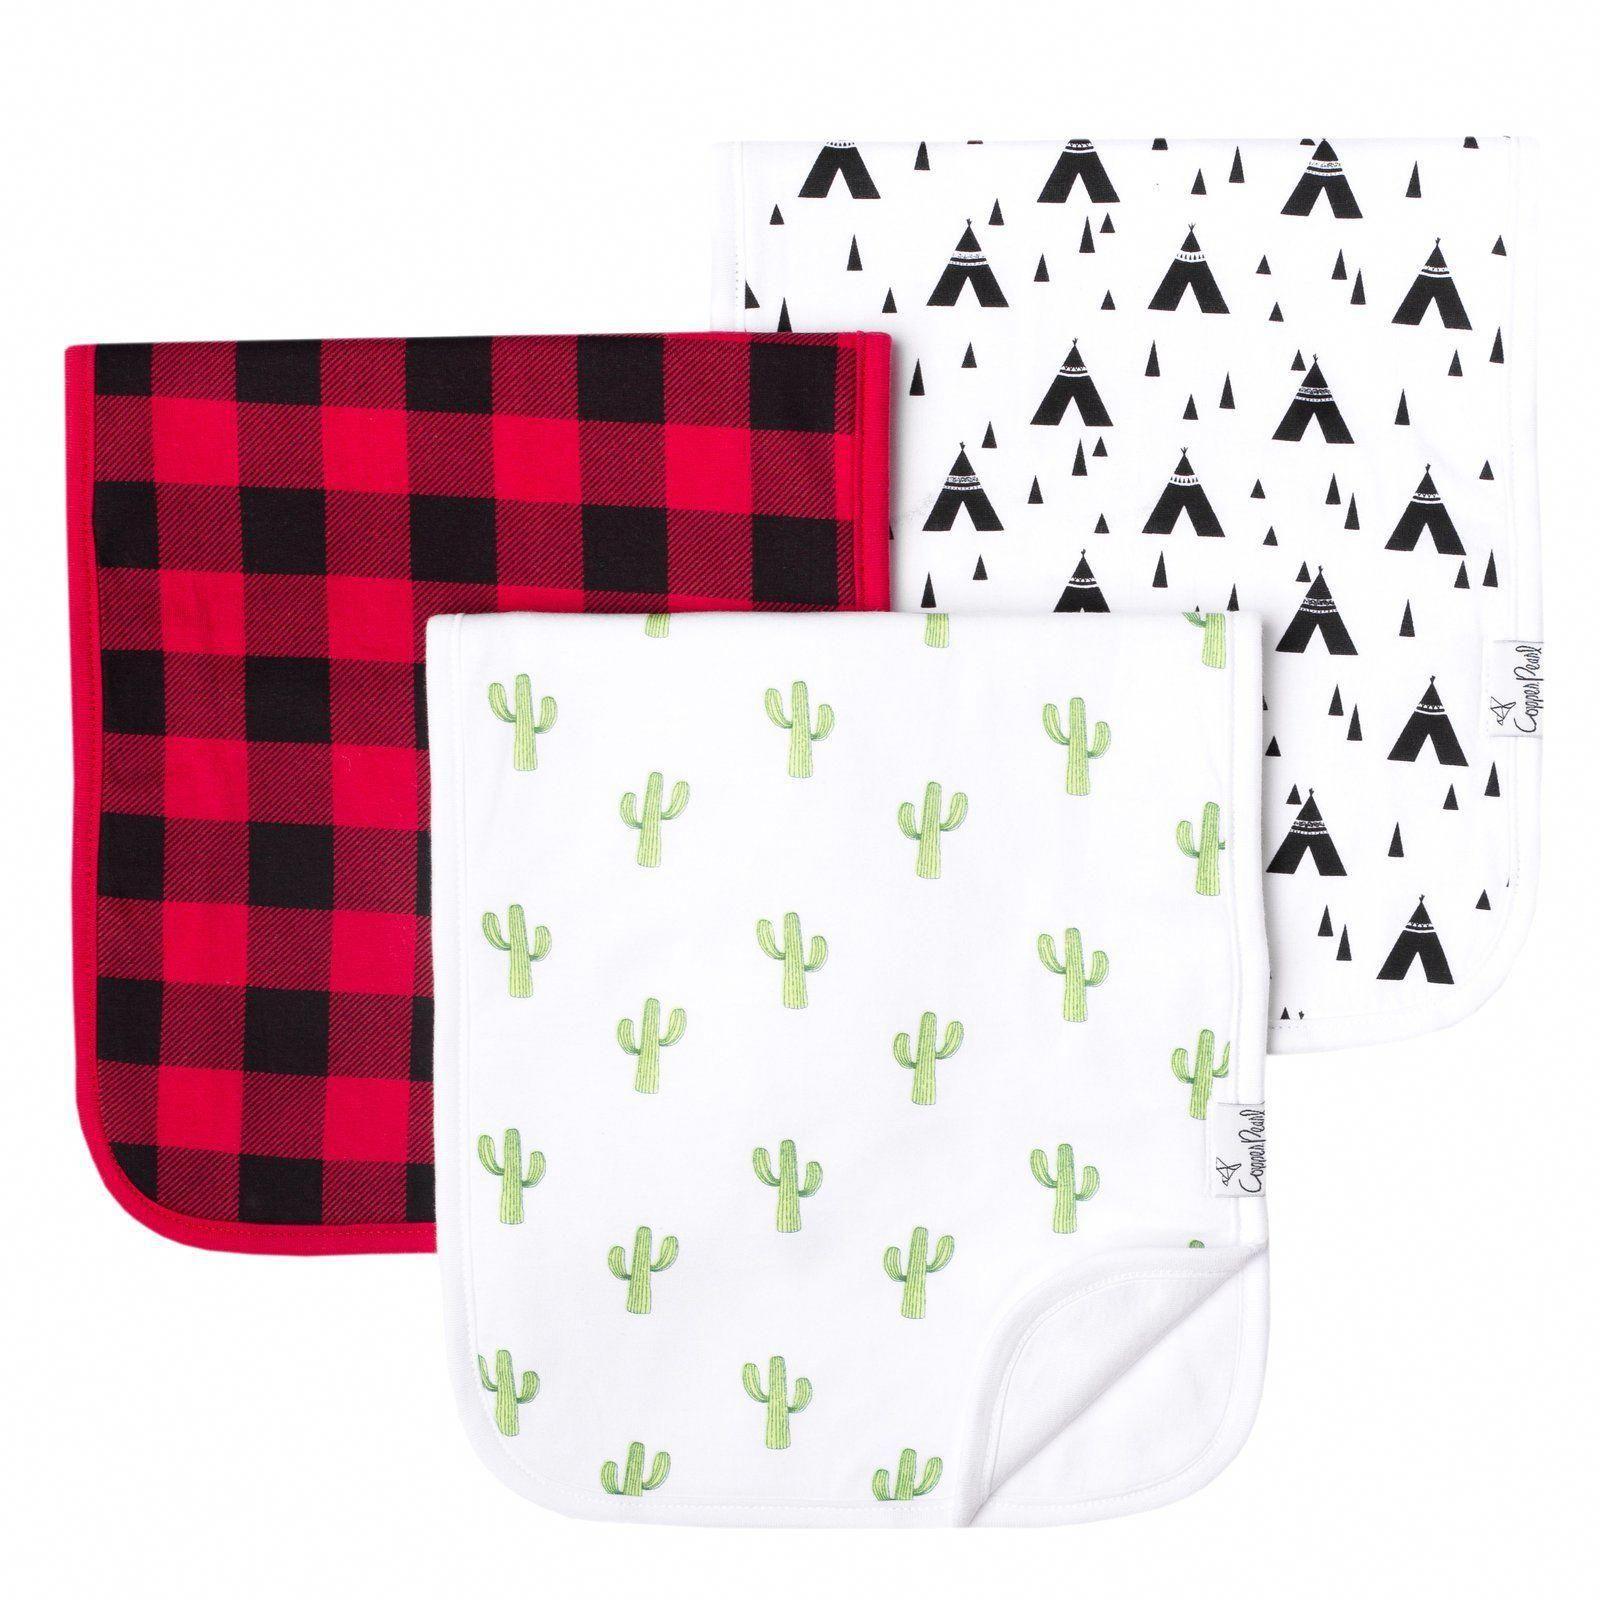 King Bedding Sets For Sale Fascinatingbeddingsets Perfectduvetcovers Burp Cloths Baby Burp Cloths Burp Cloth Set